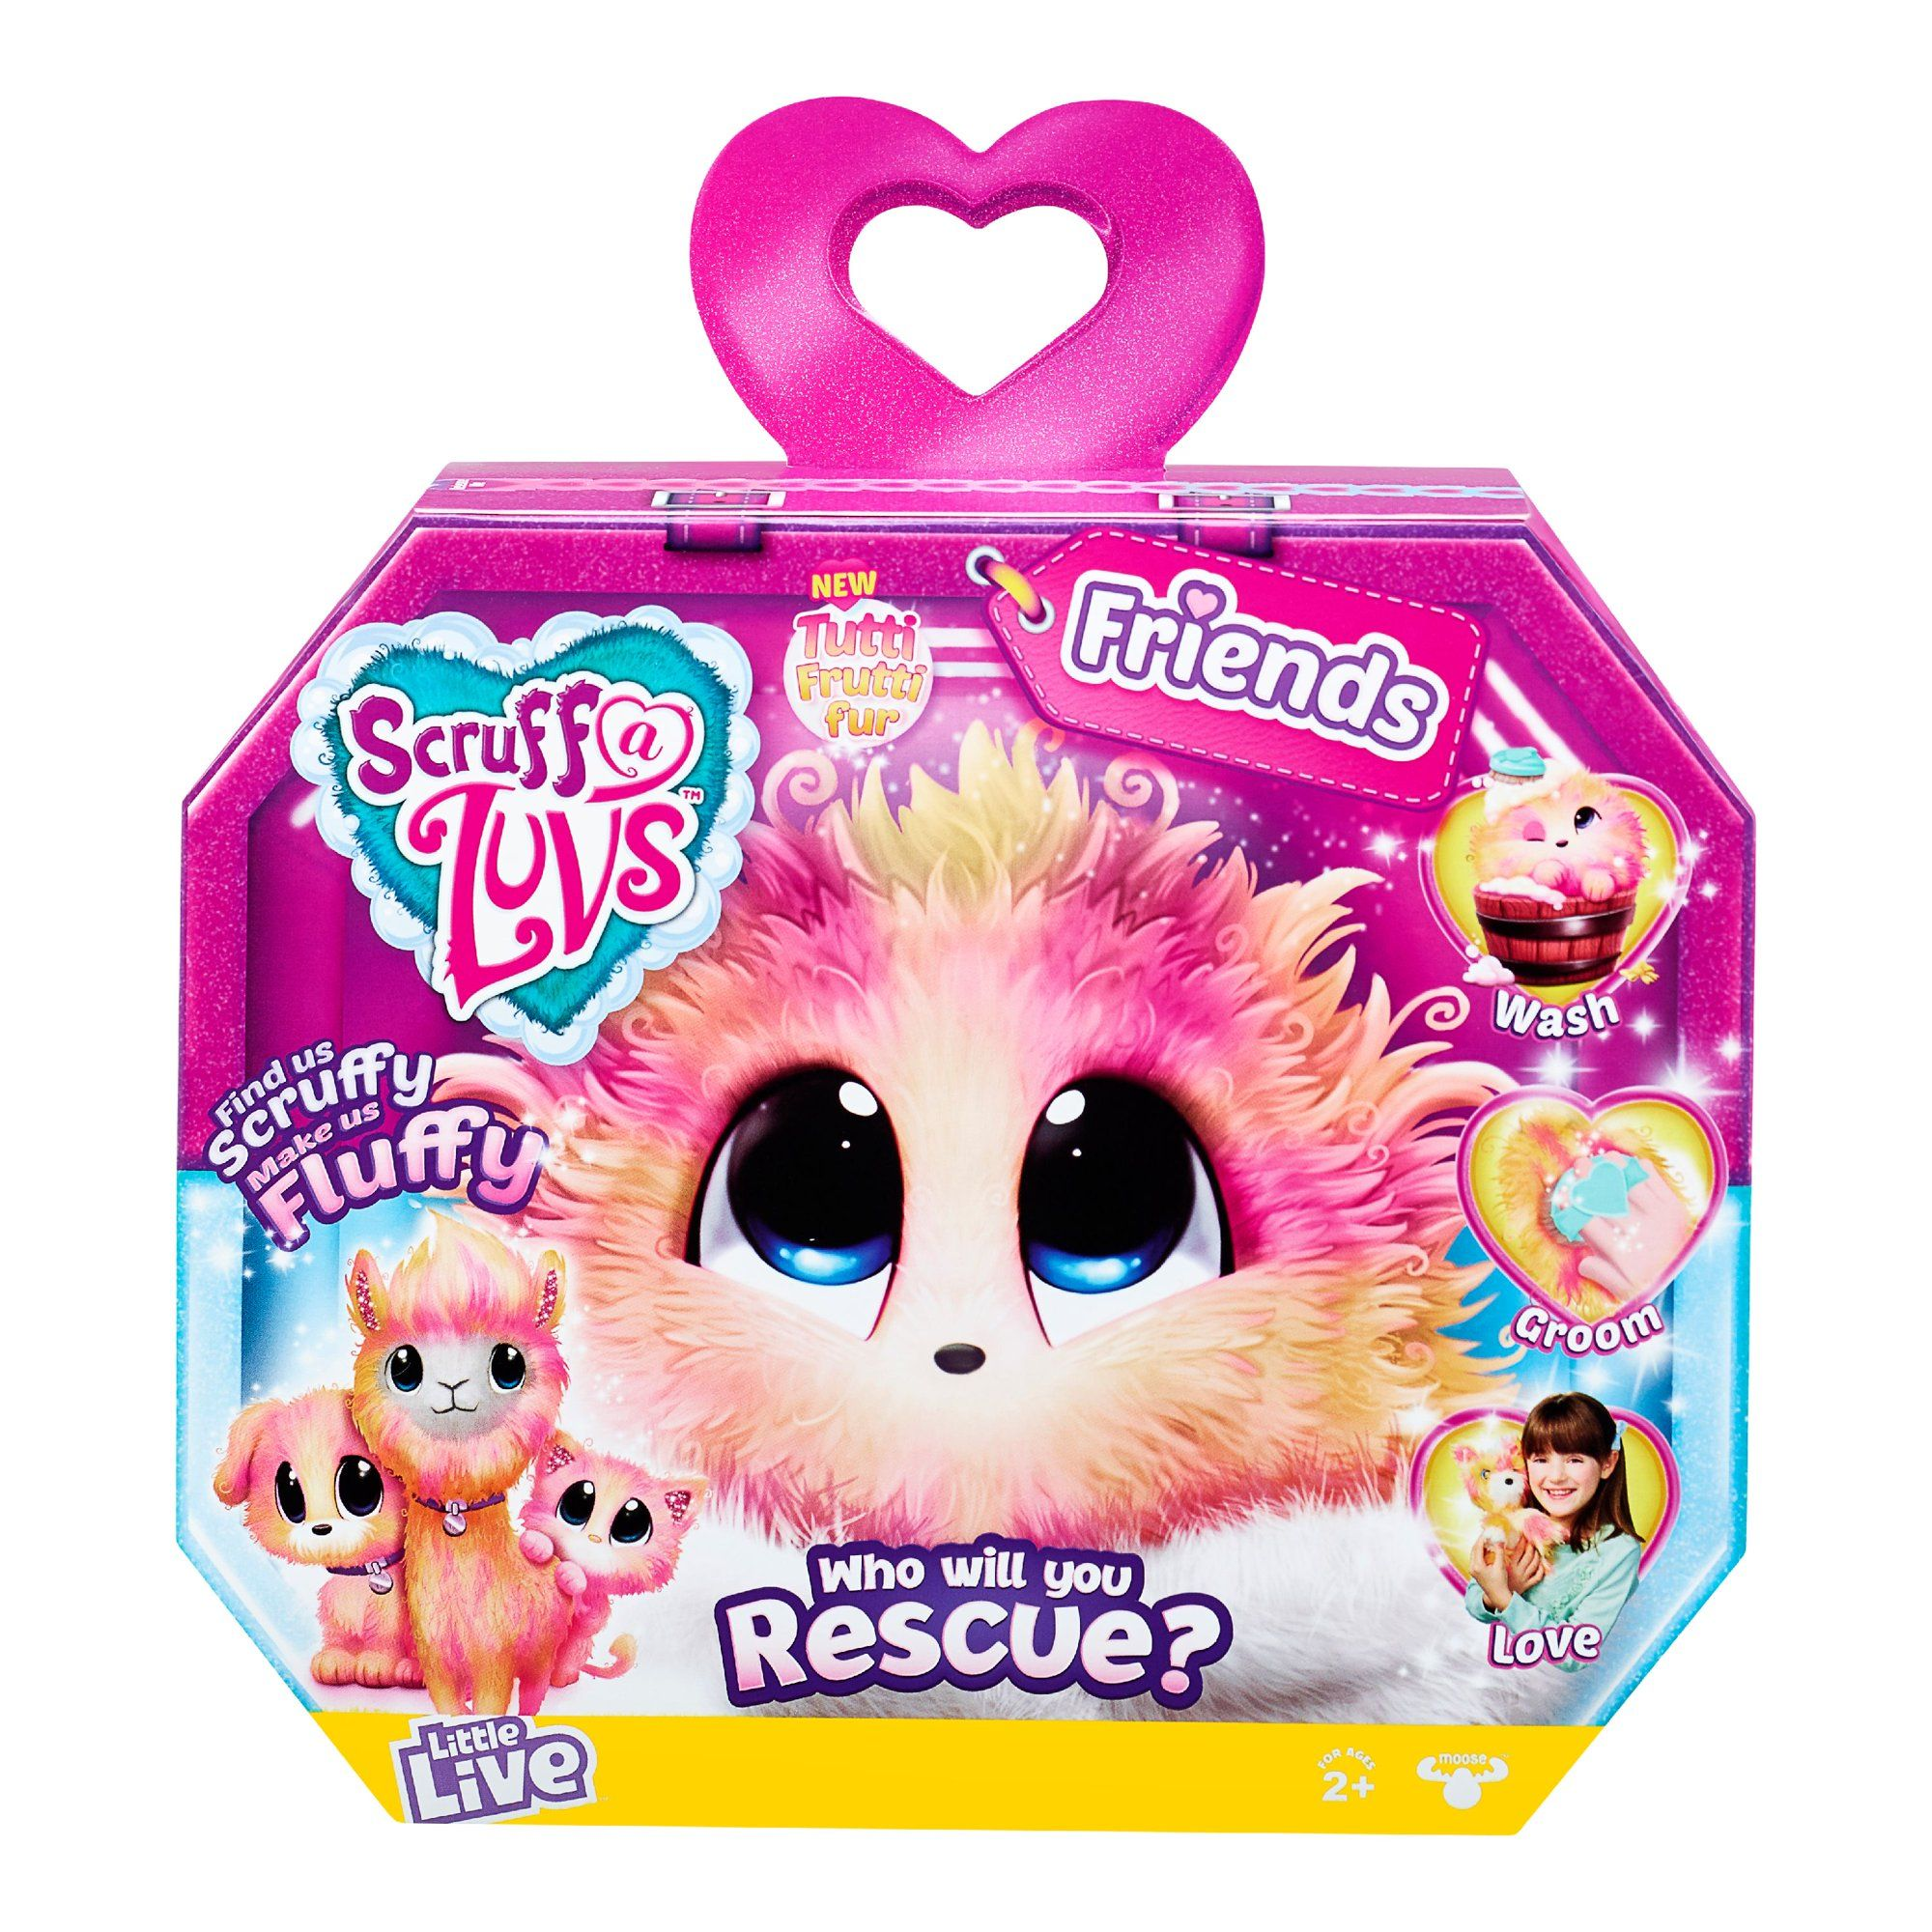 Little Live Pets Scruff A Luvs Plush Mystery Rescue Pet Tutti Fruitti Walmart Com In 2020 Little Live Pets Toys For Girls Rabbit Toys